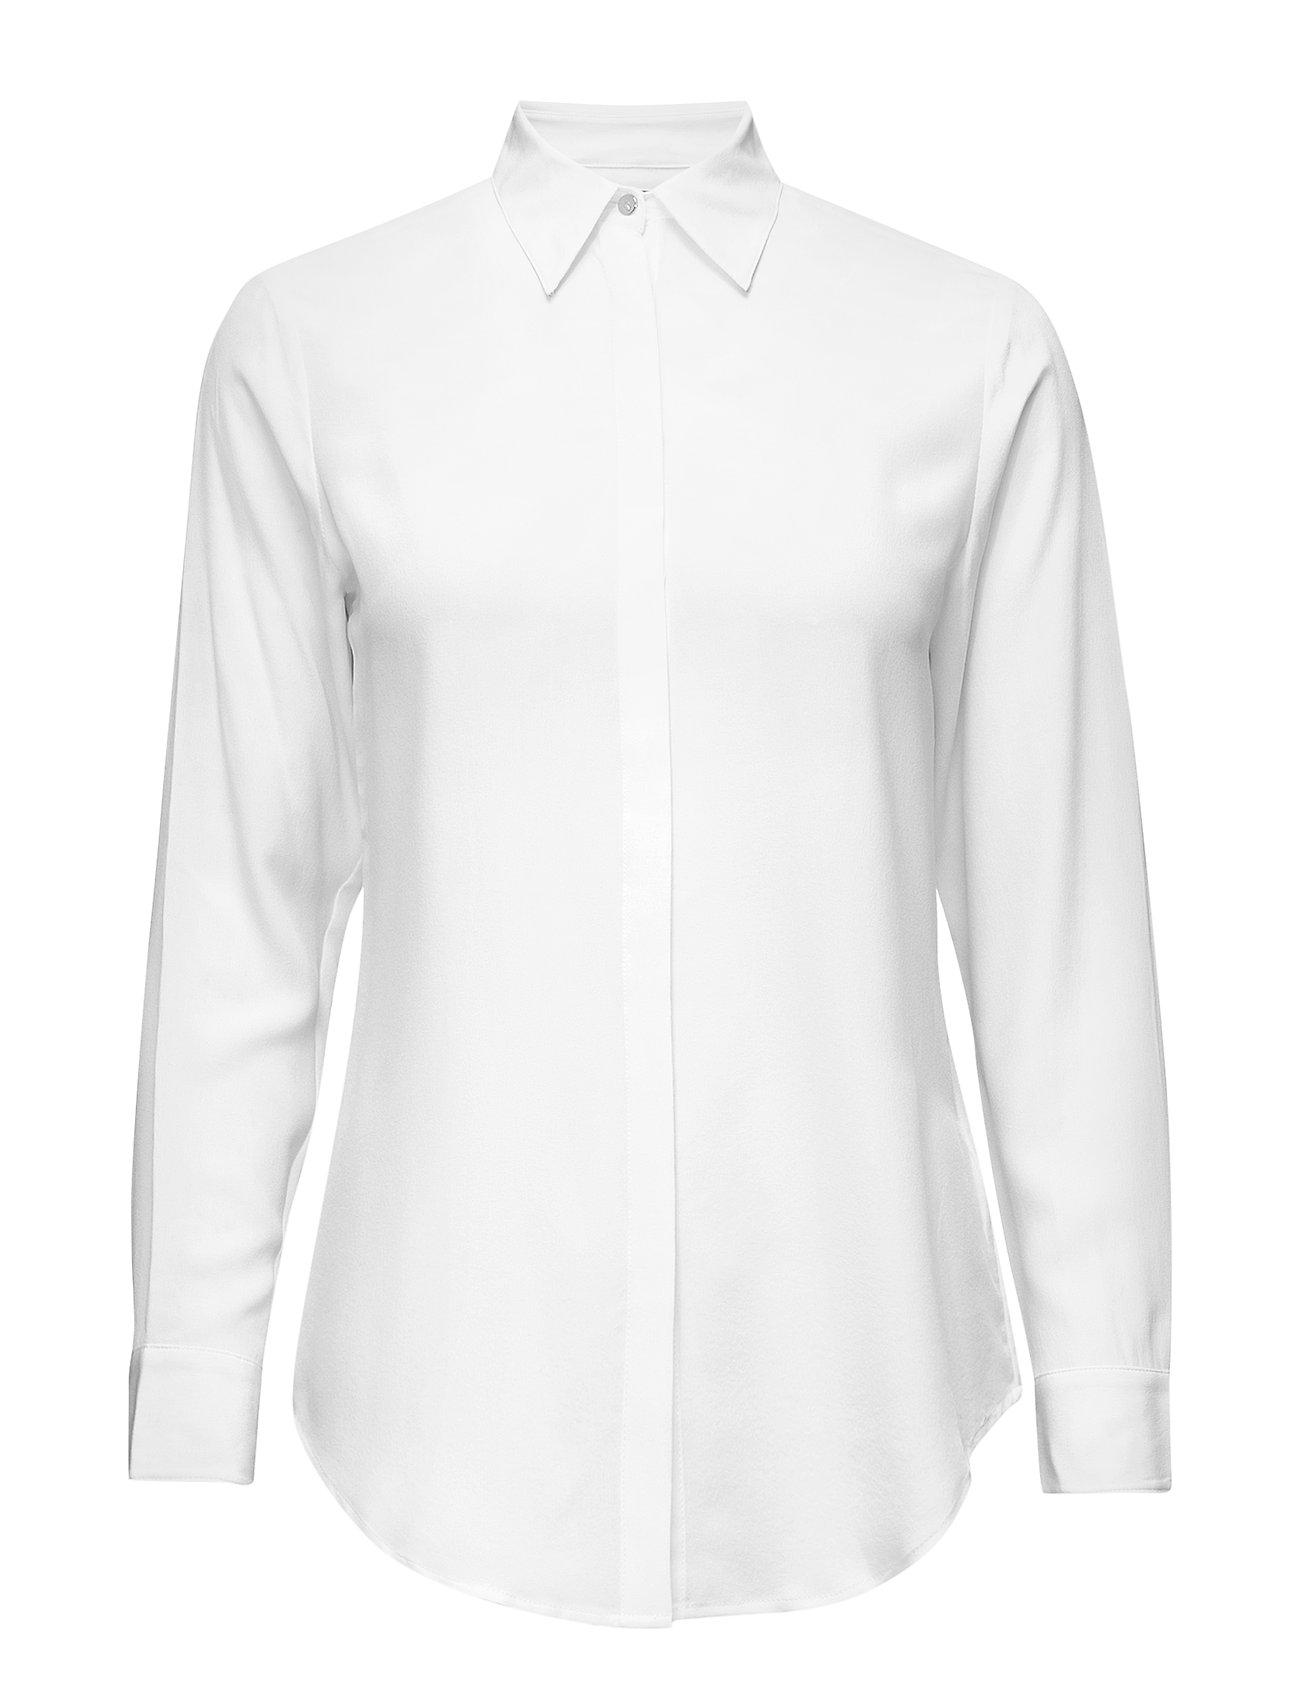 CreamLauren Button Ralph down Shirtmascarpone Crepe Silk 8Xw0OnkP